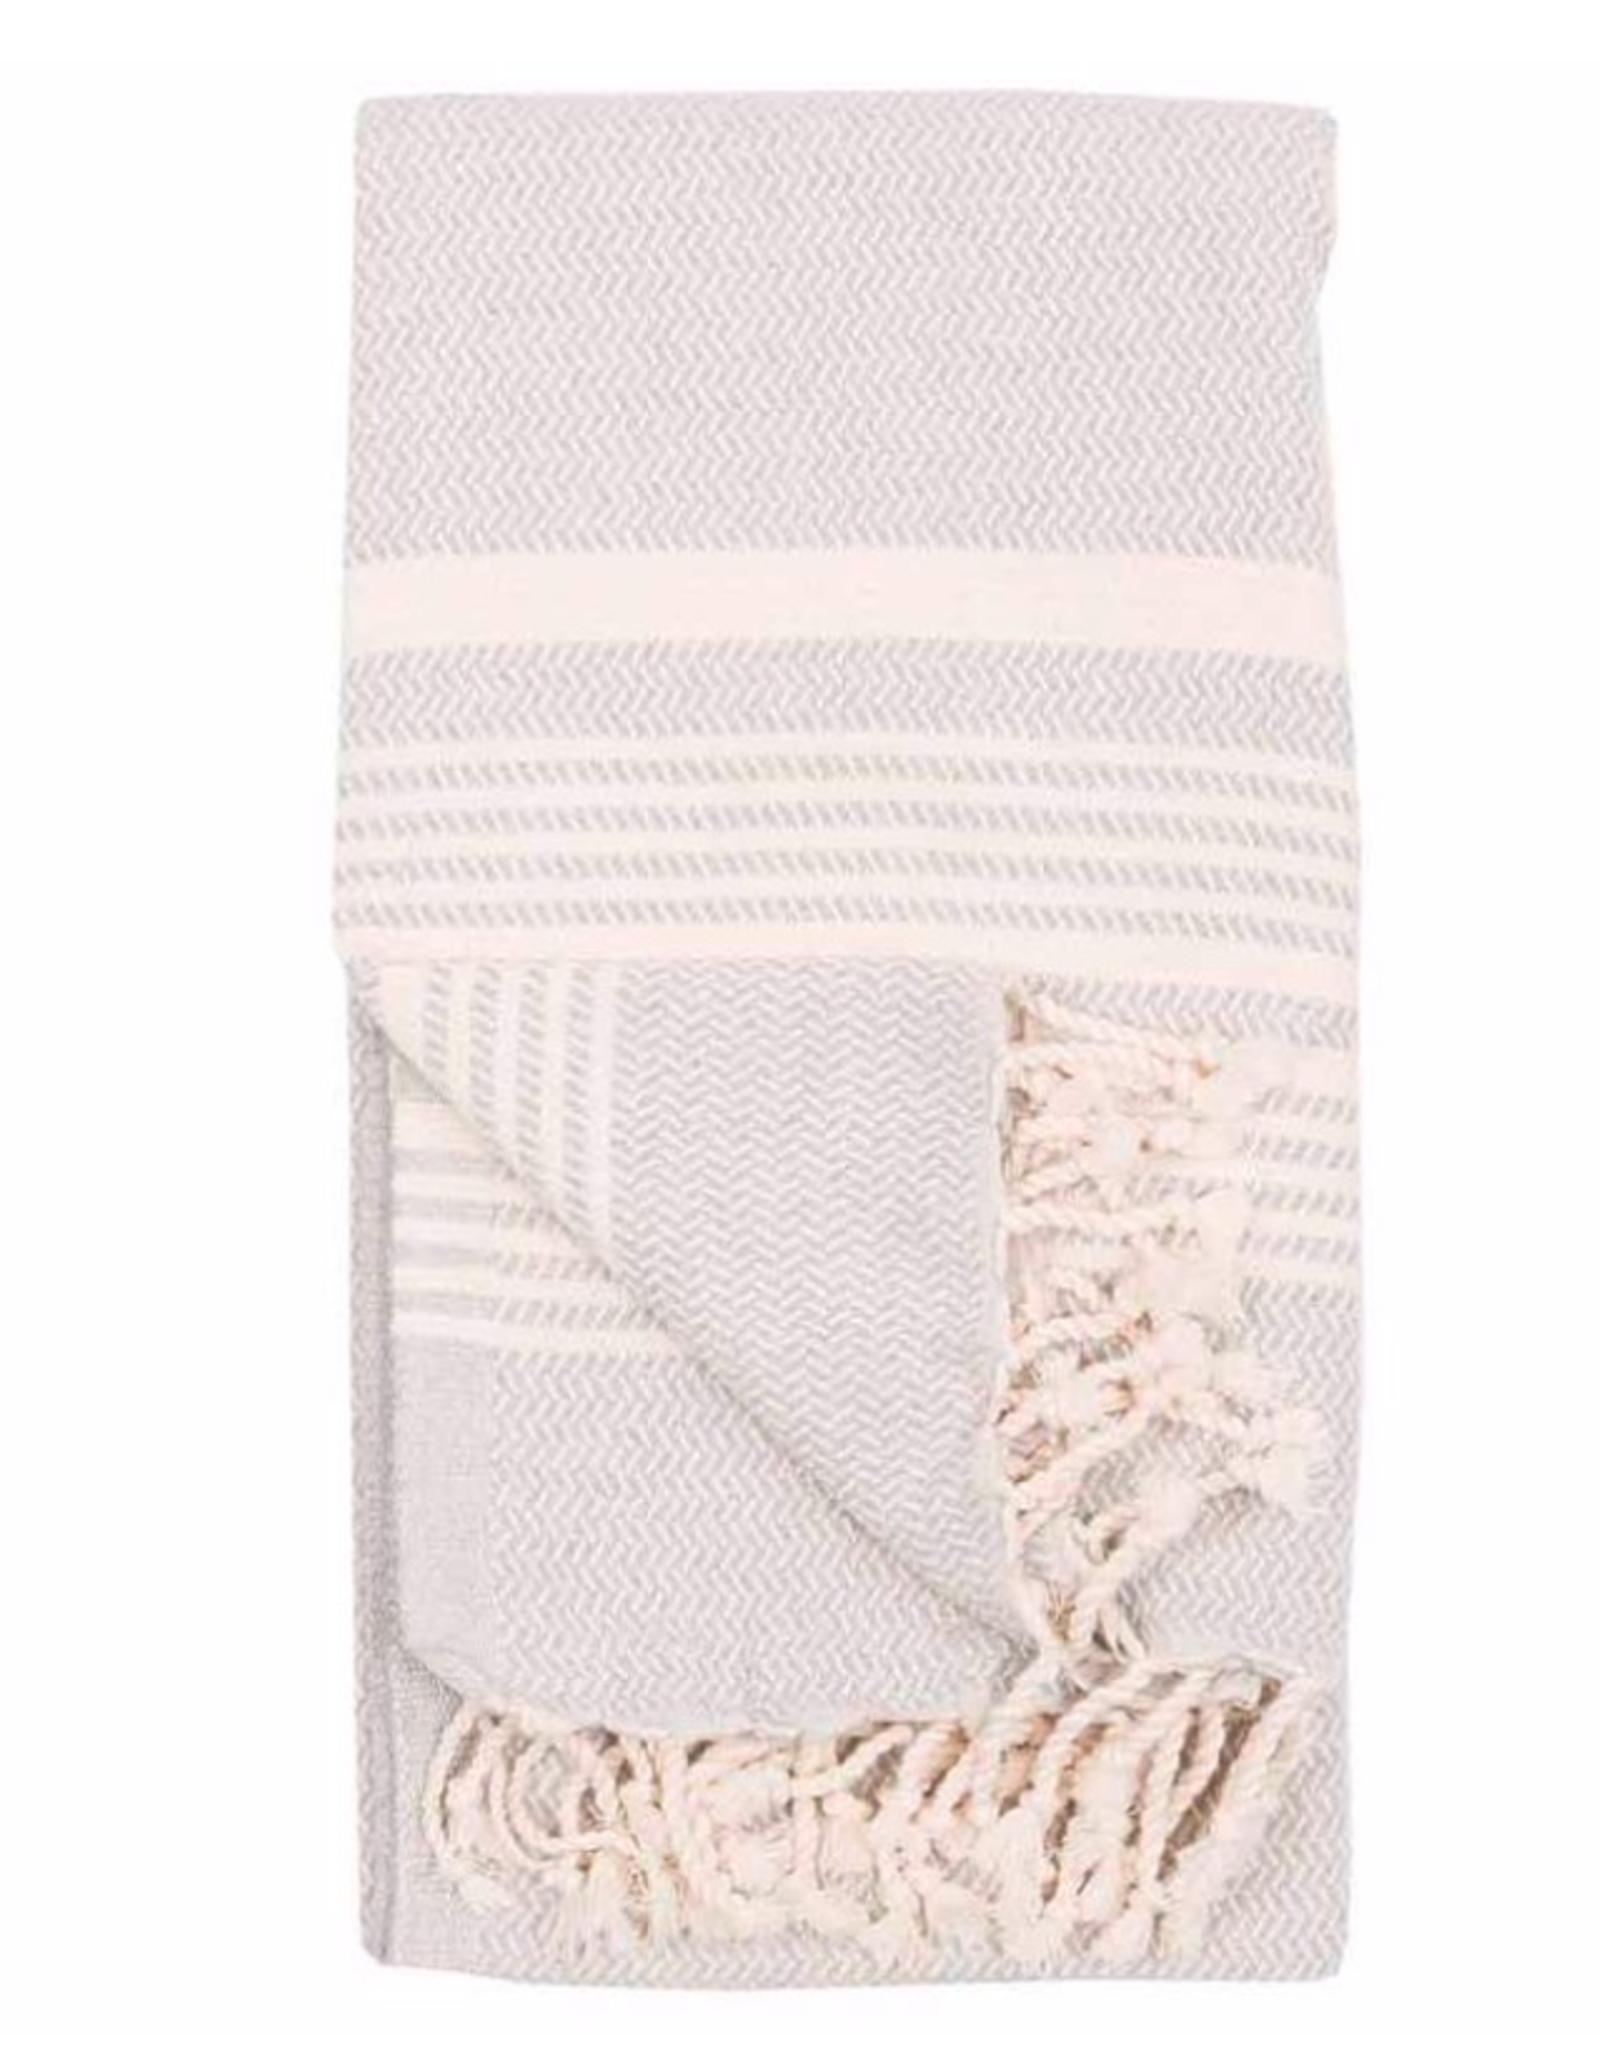 Slate Hasir Turkish Towel